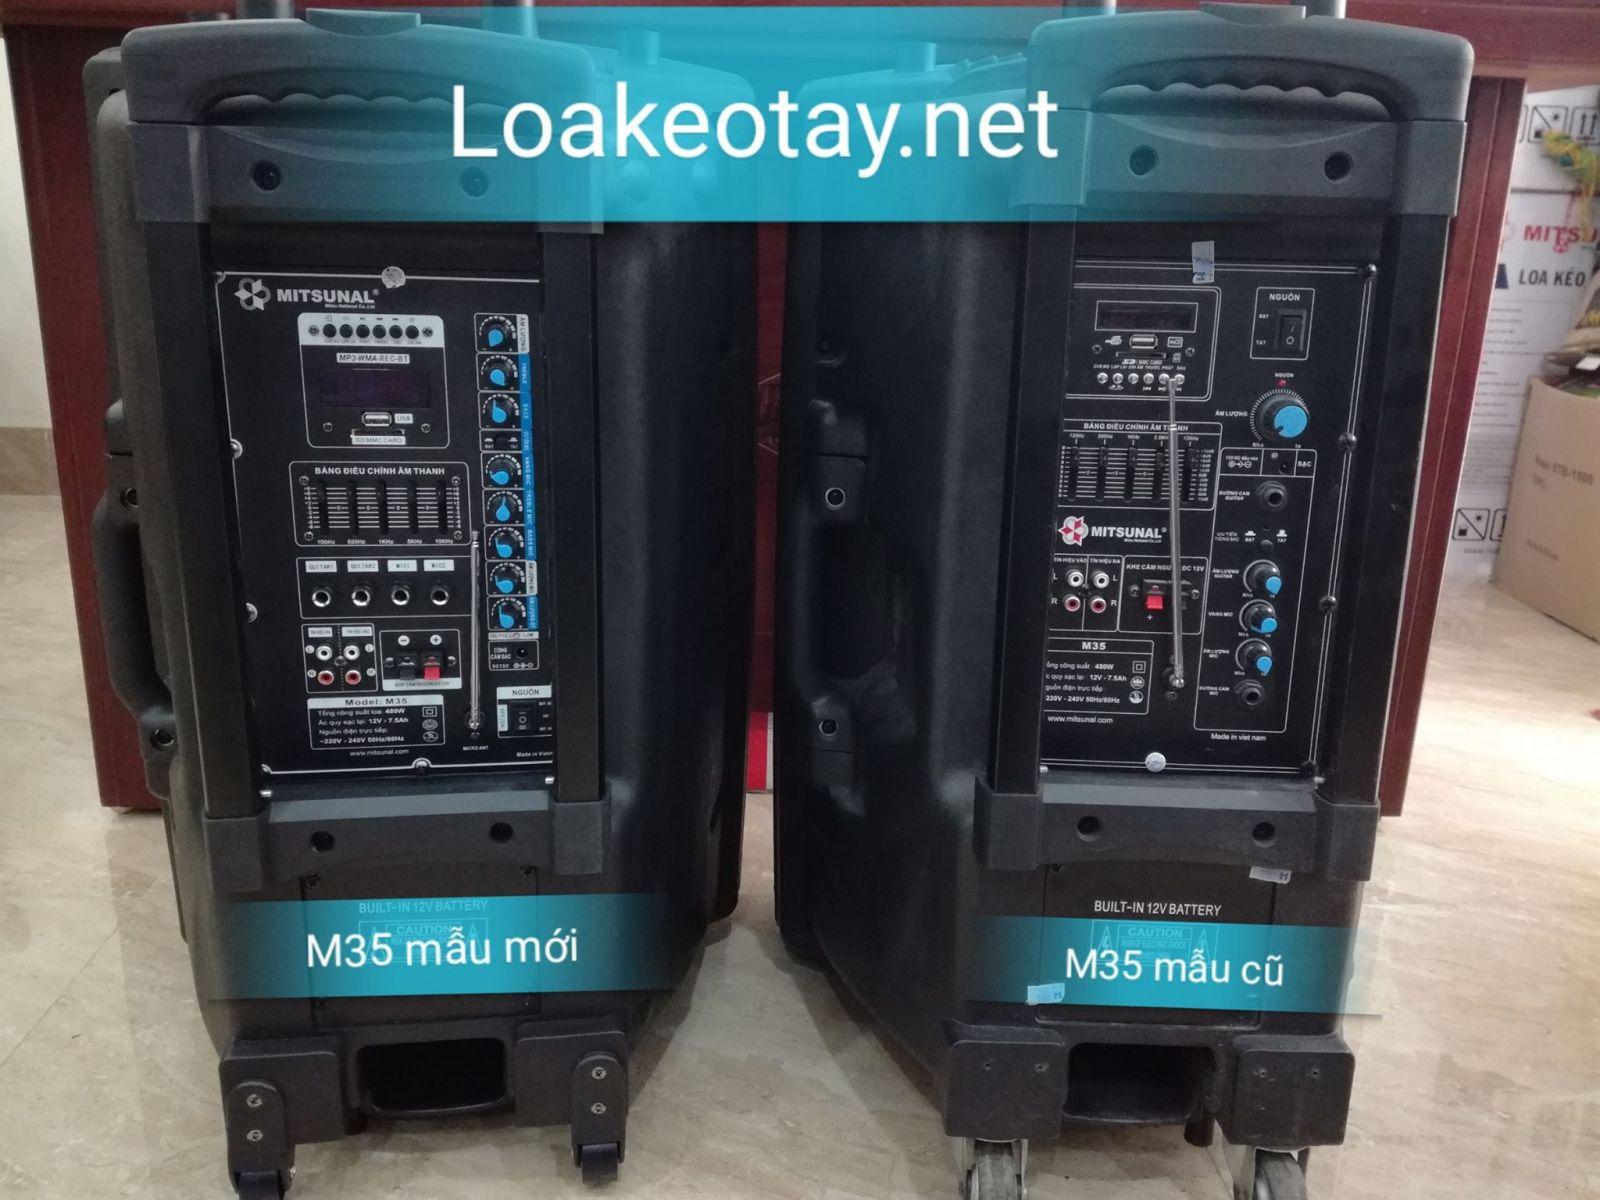 loa-keo-tay-di-dong-mitsunal-m35-2017